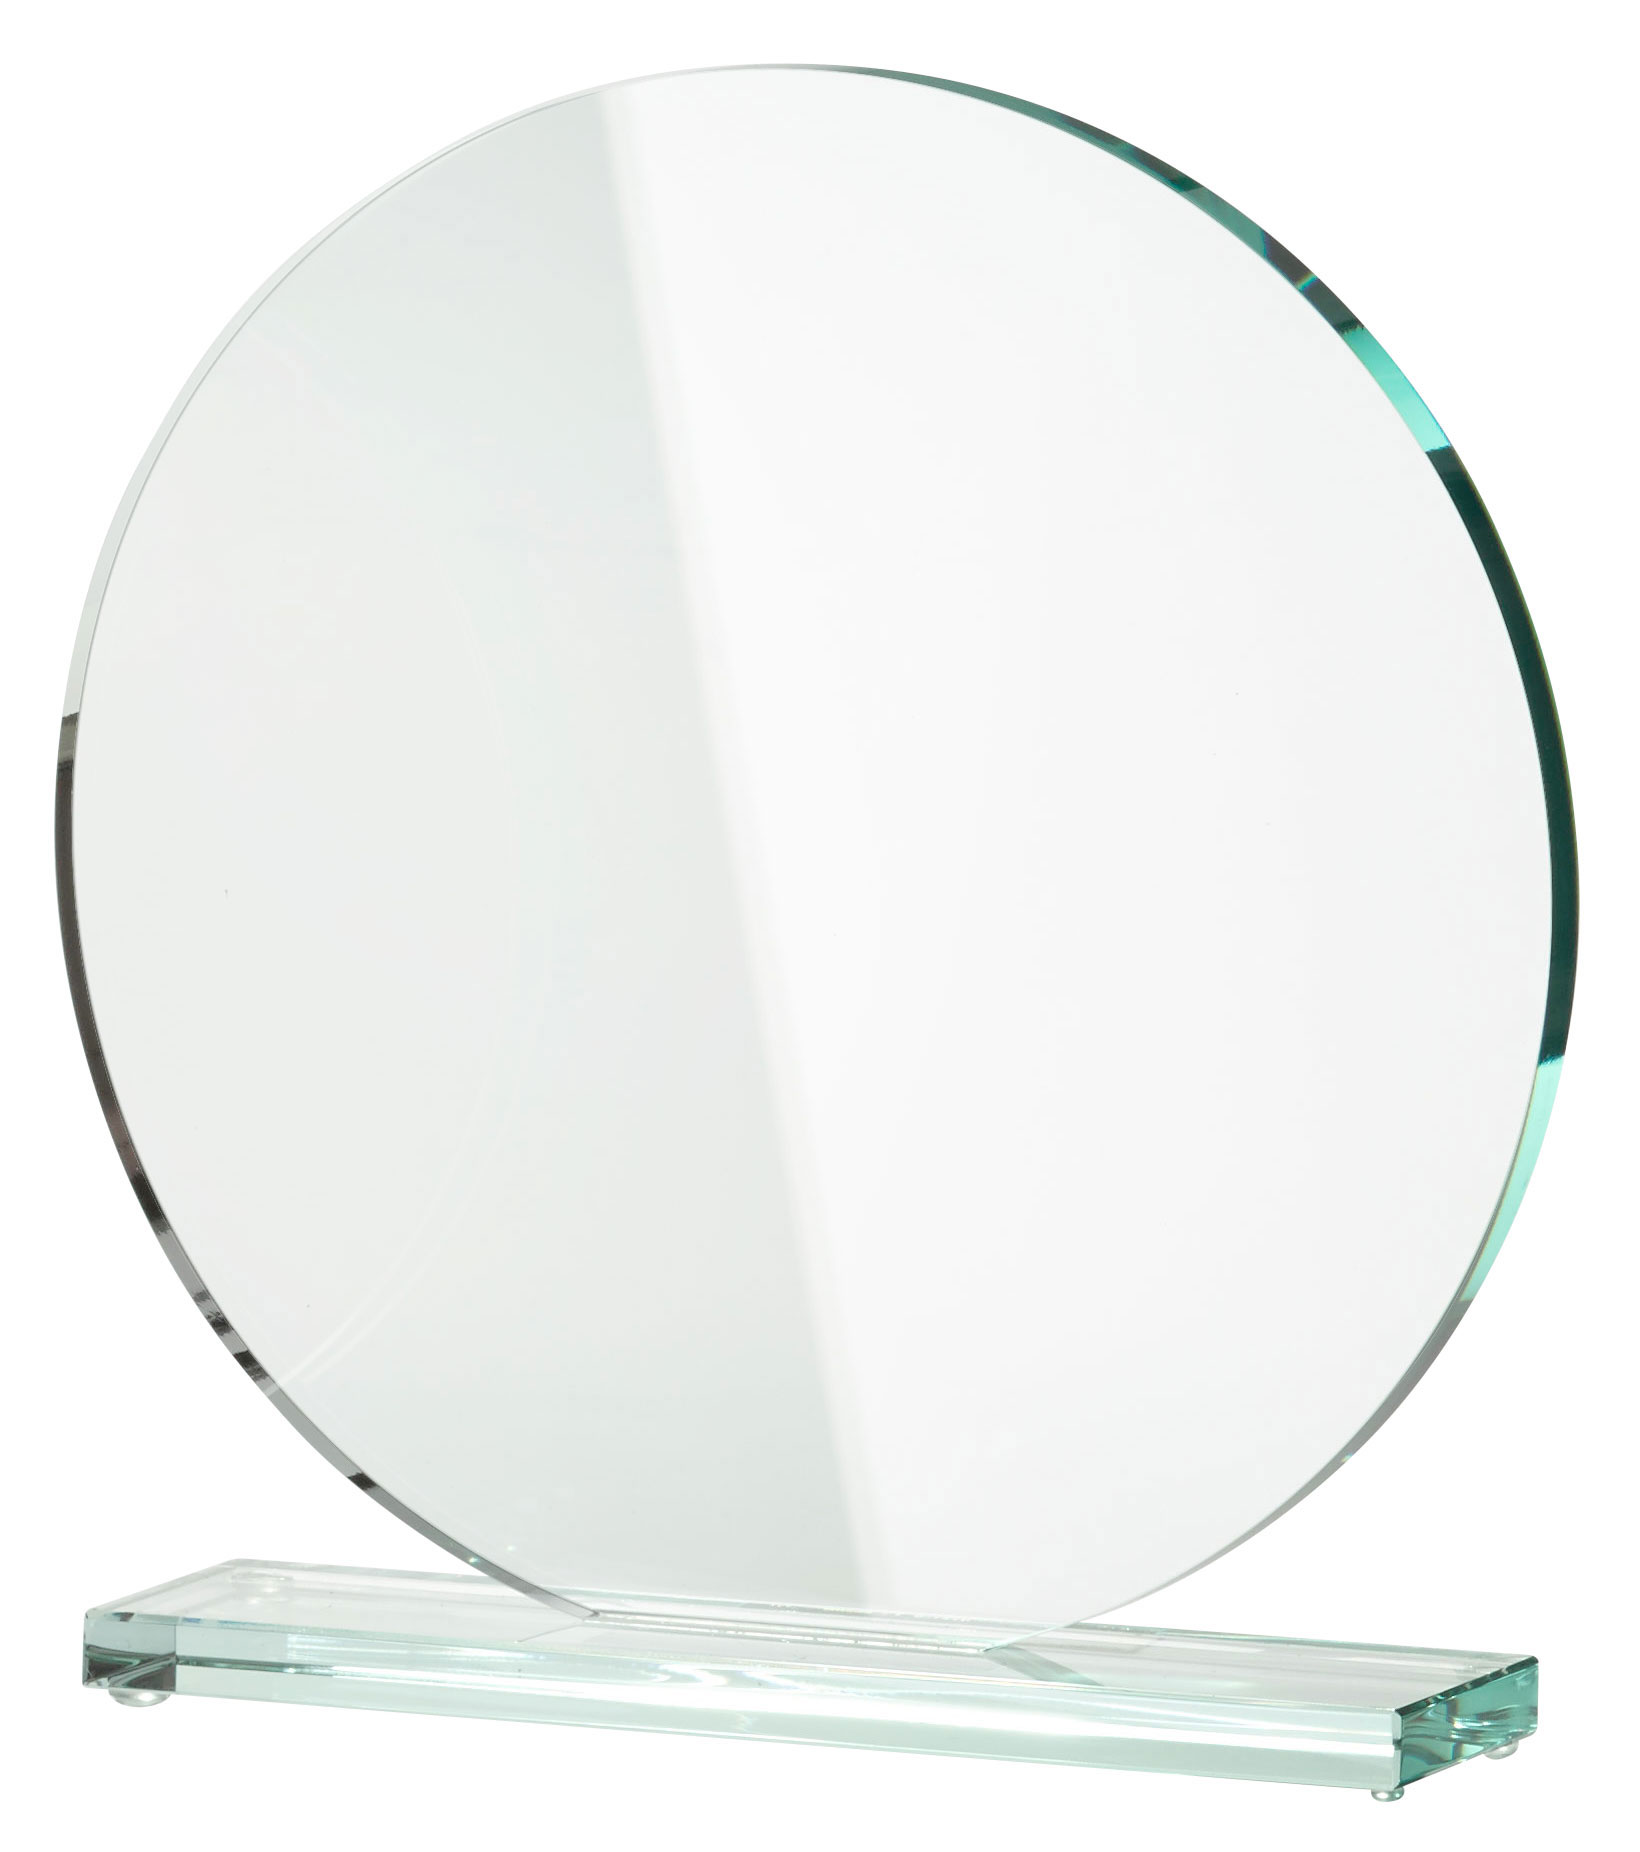 Glas standaard B331 | Sportprijzen Vught